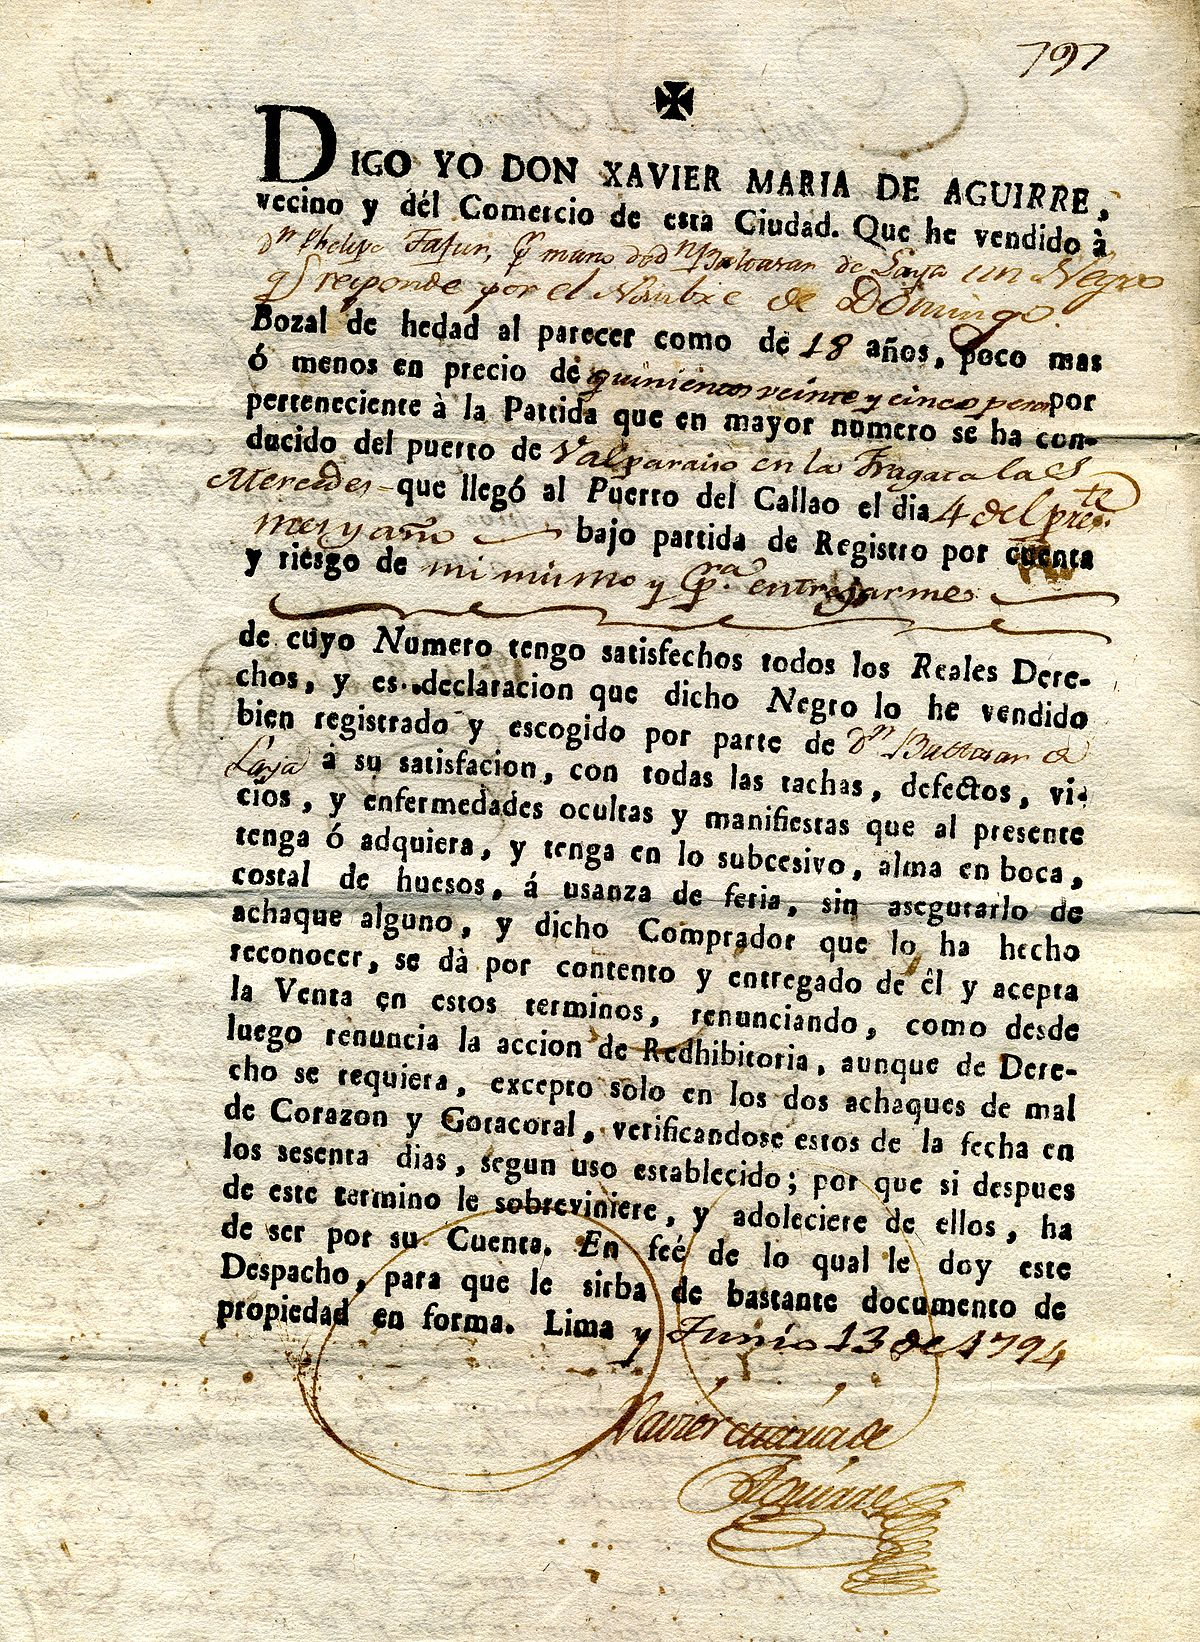 Esclavitud en espa a wikipedia la enciclopedia libre for Actividades que se realizan en una oficina wikipedia